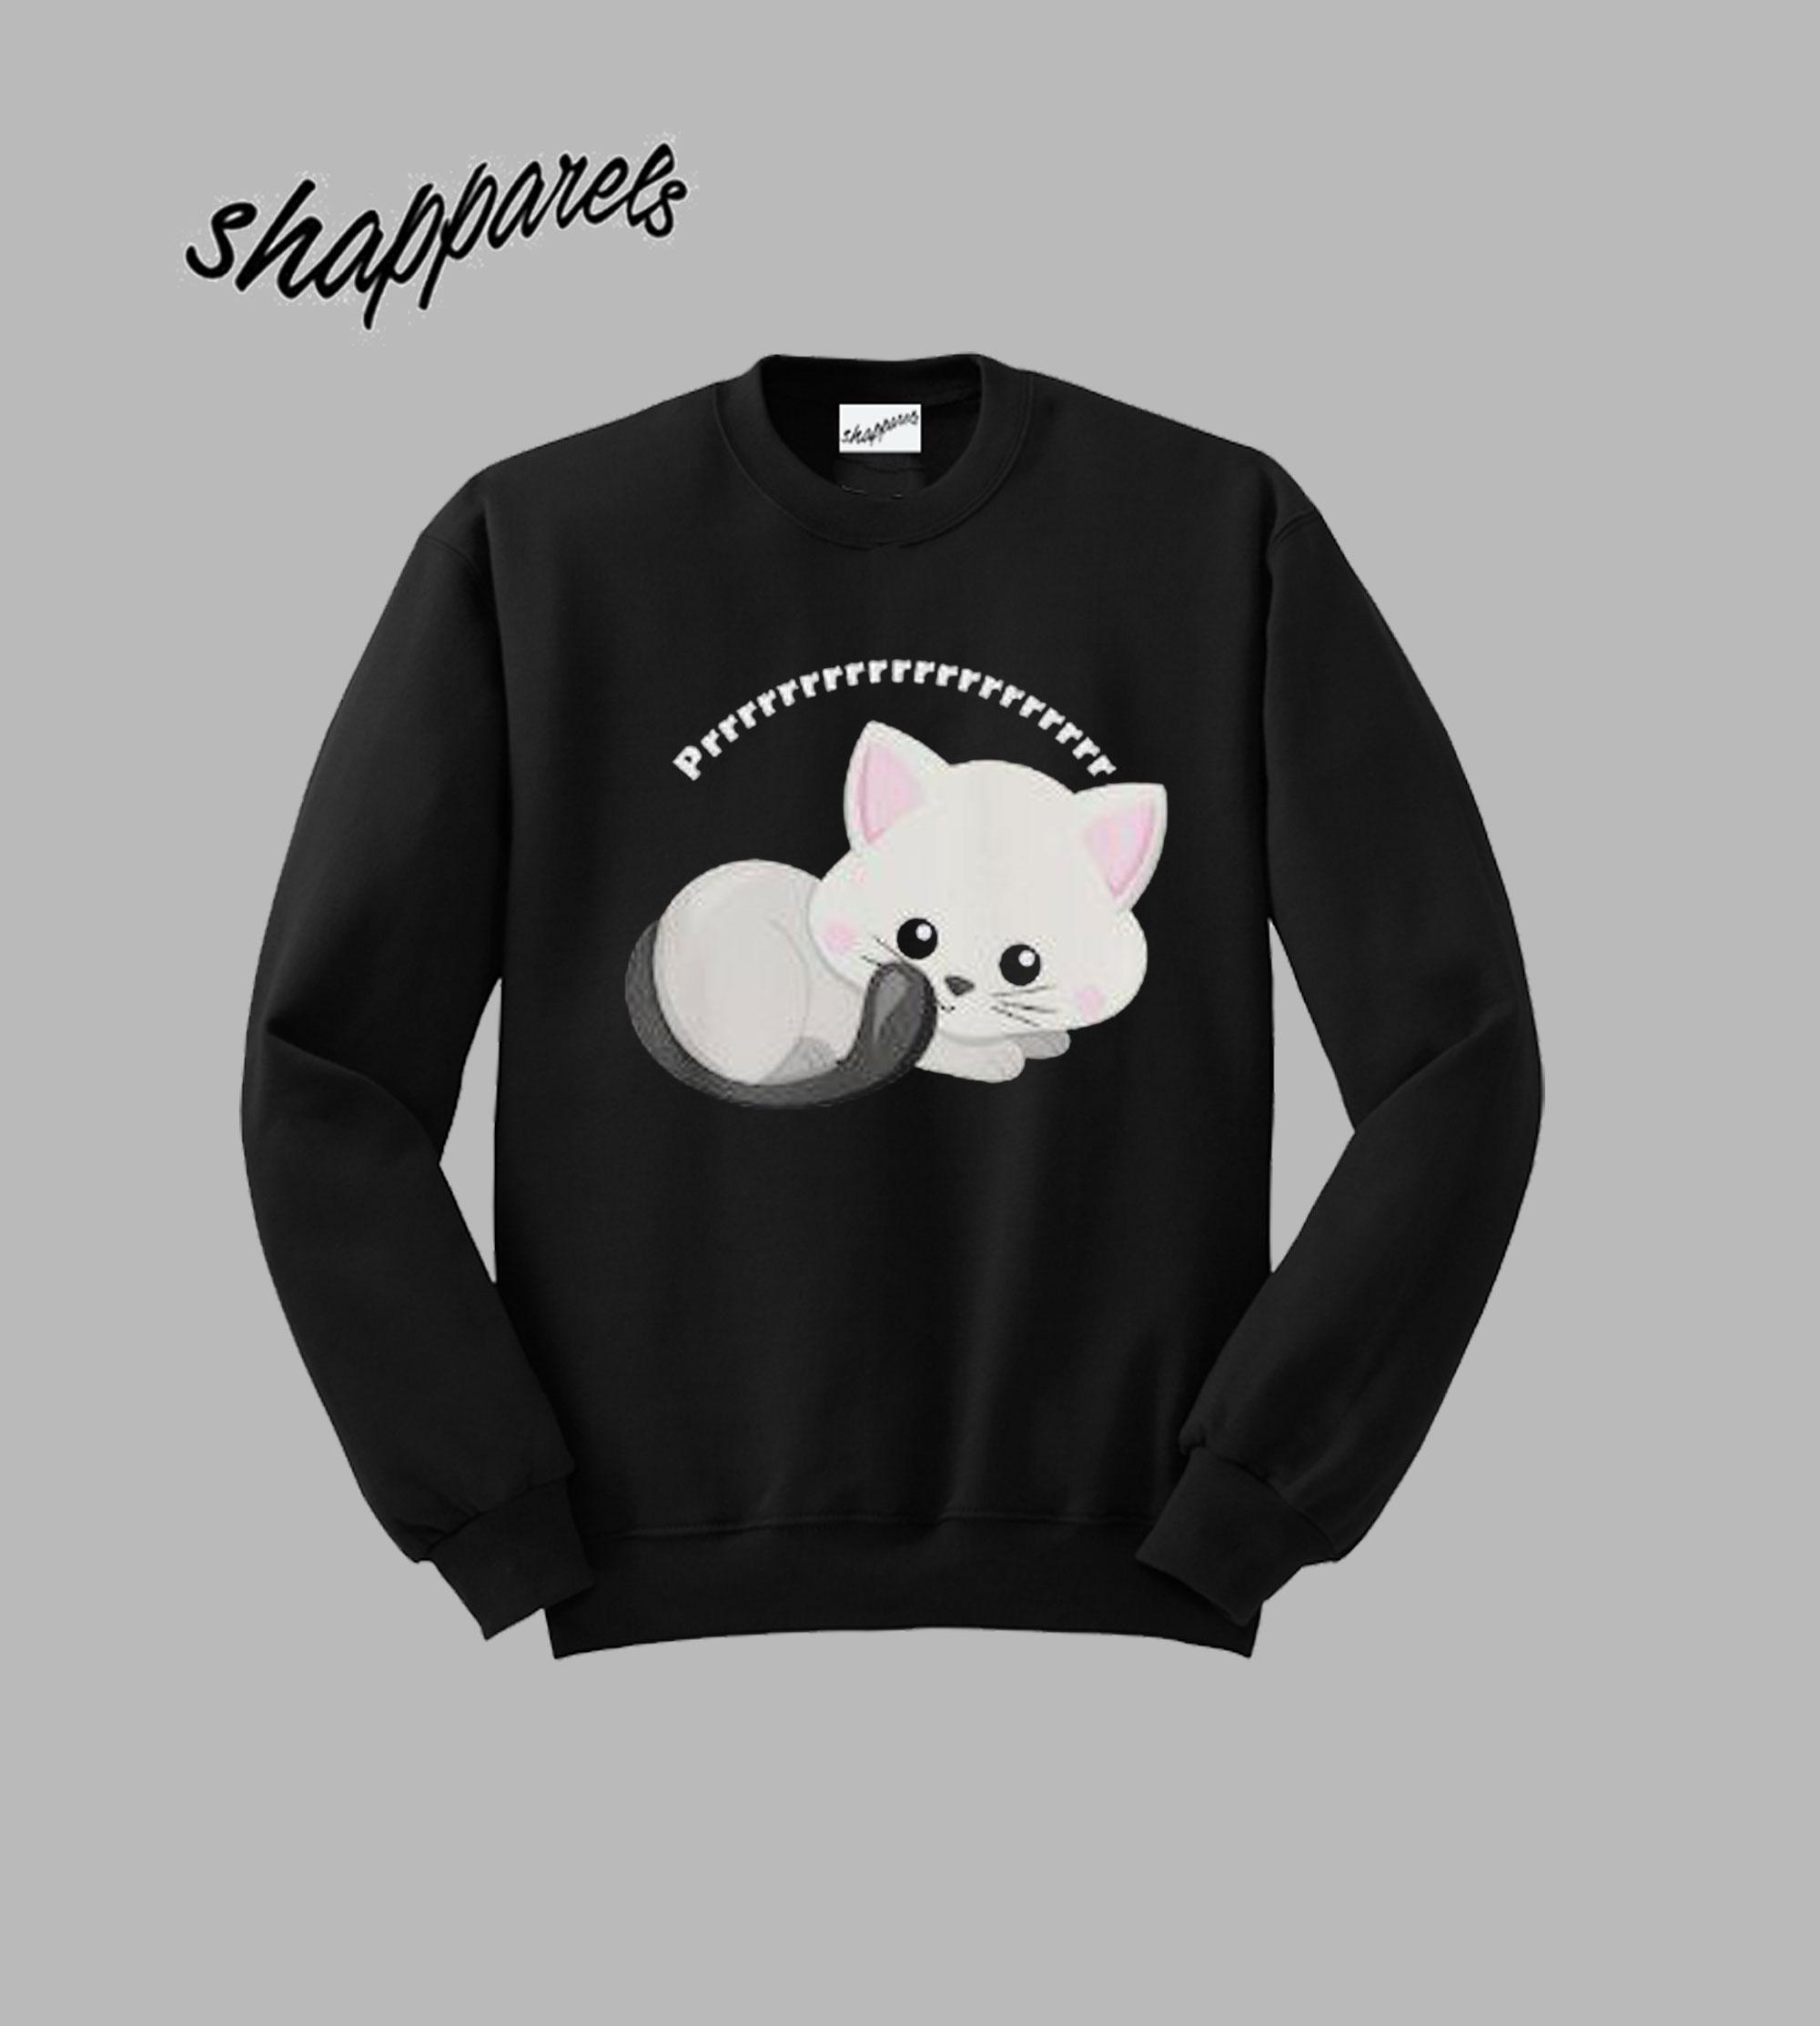 Adorable White Kitten Prrrr Sweatshirt